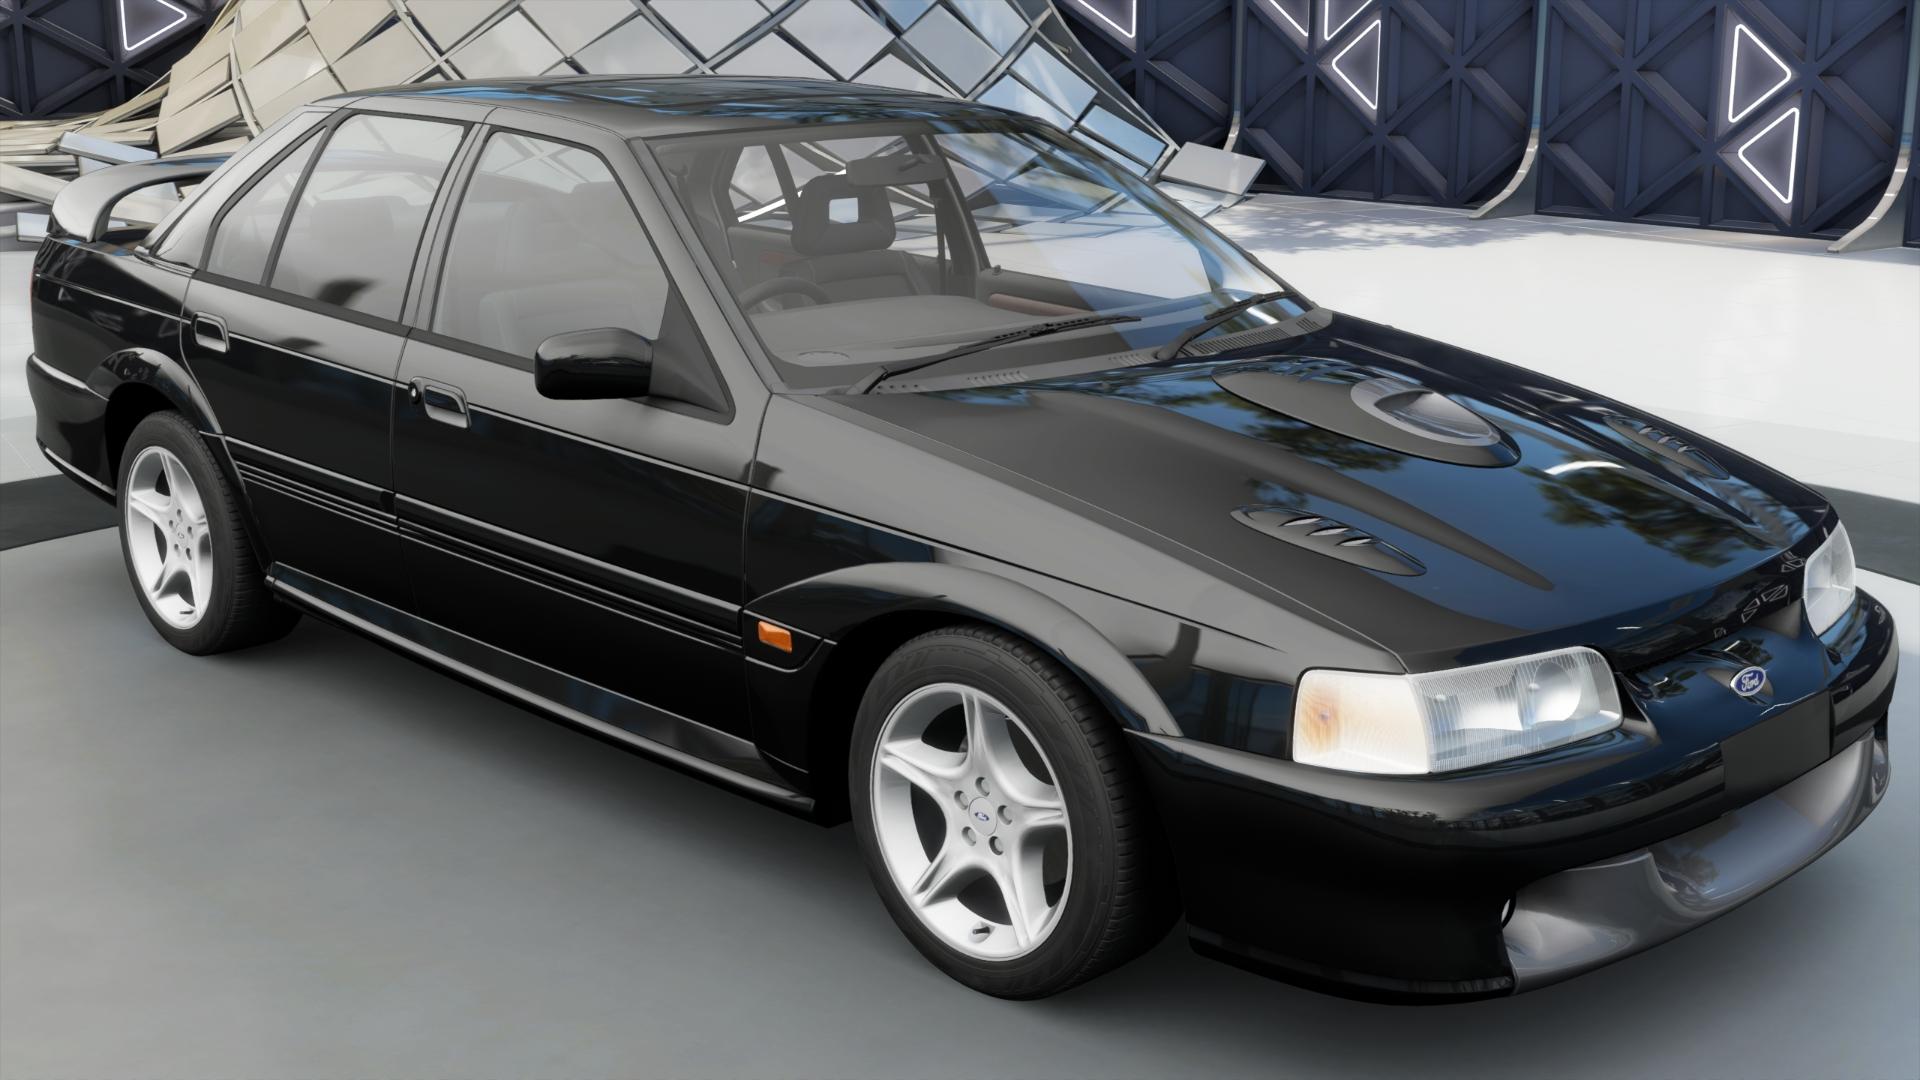 Ford Falcon GT | Forza Motorsport Wiki | FANDOM powered by Wikia